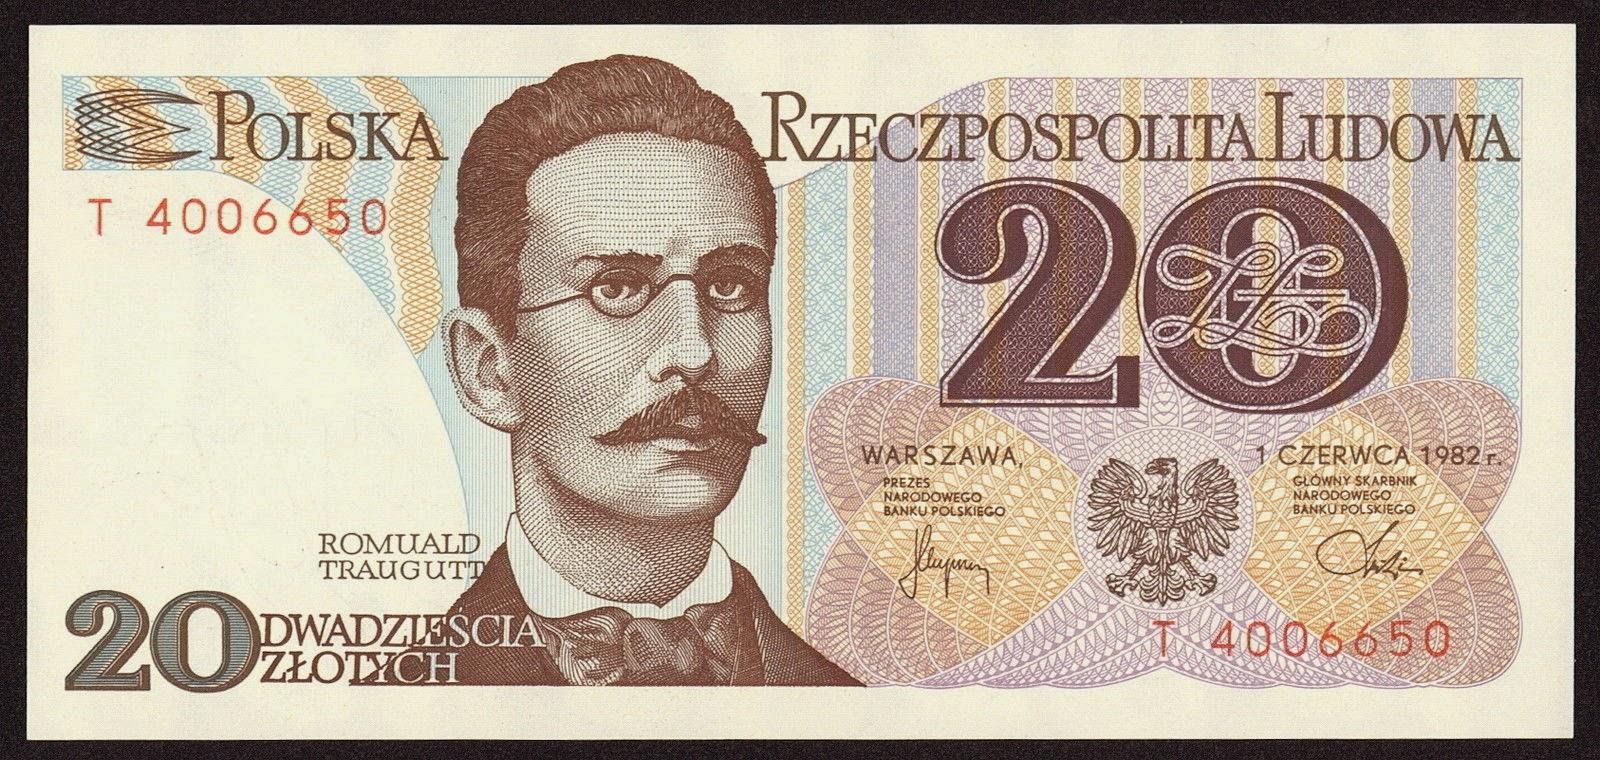 Poland Banknotes 20 Zloty banknote 1982 Romuald Traugutt